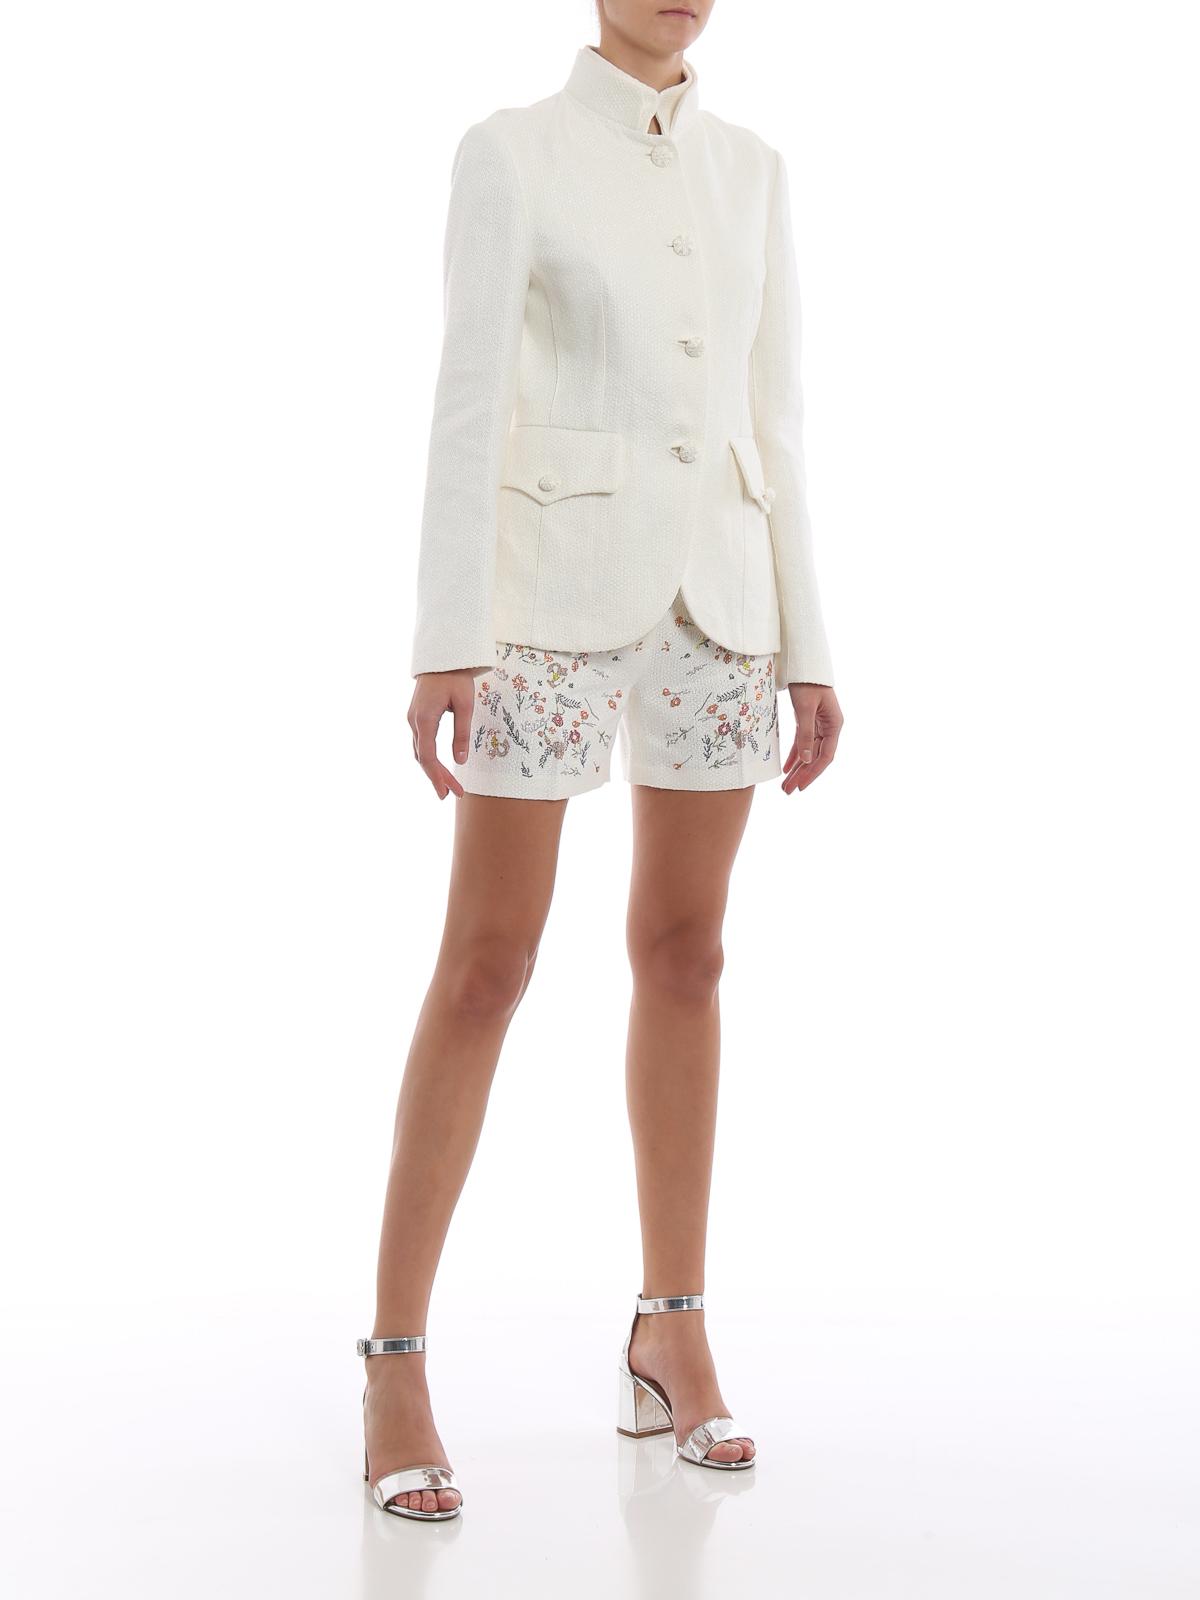 huge discount 67f3d 48118 Ermanno Scervino - Giacca bianca elegante in misto lino ...